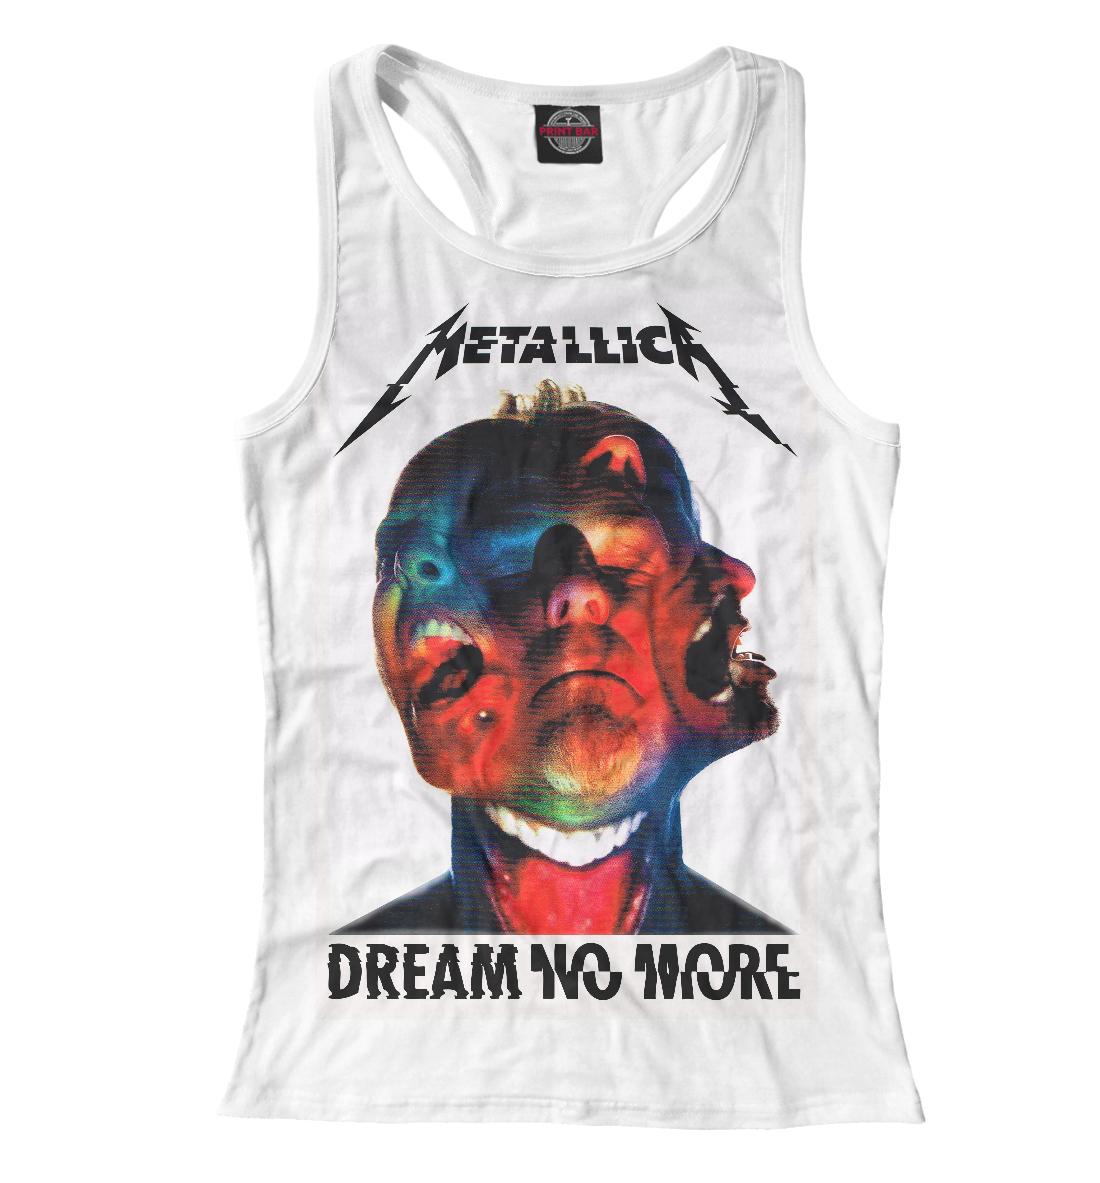 Купить Metallica Dream No More, Printbar, Майки борцовки, MET-651214-mayb-1